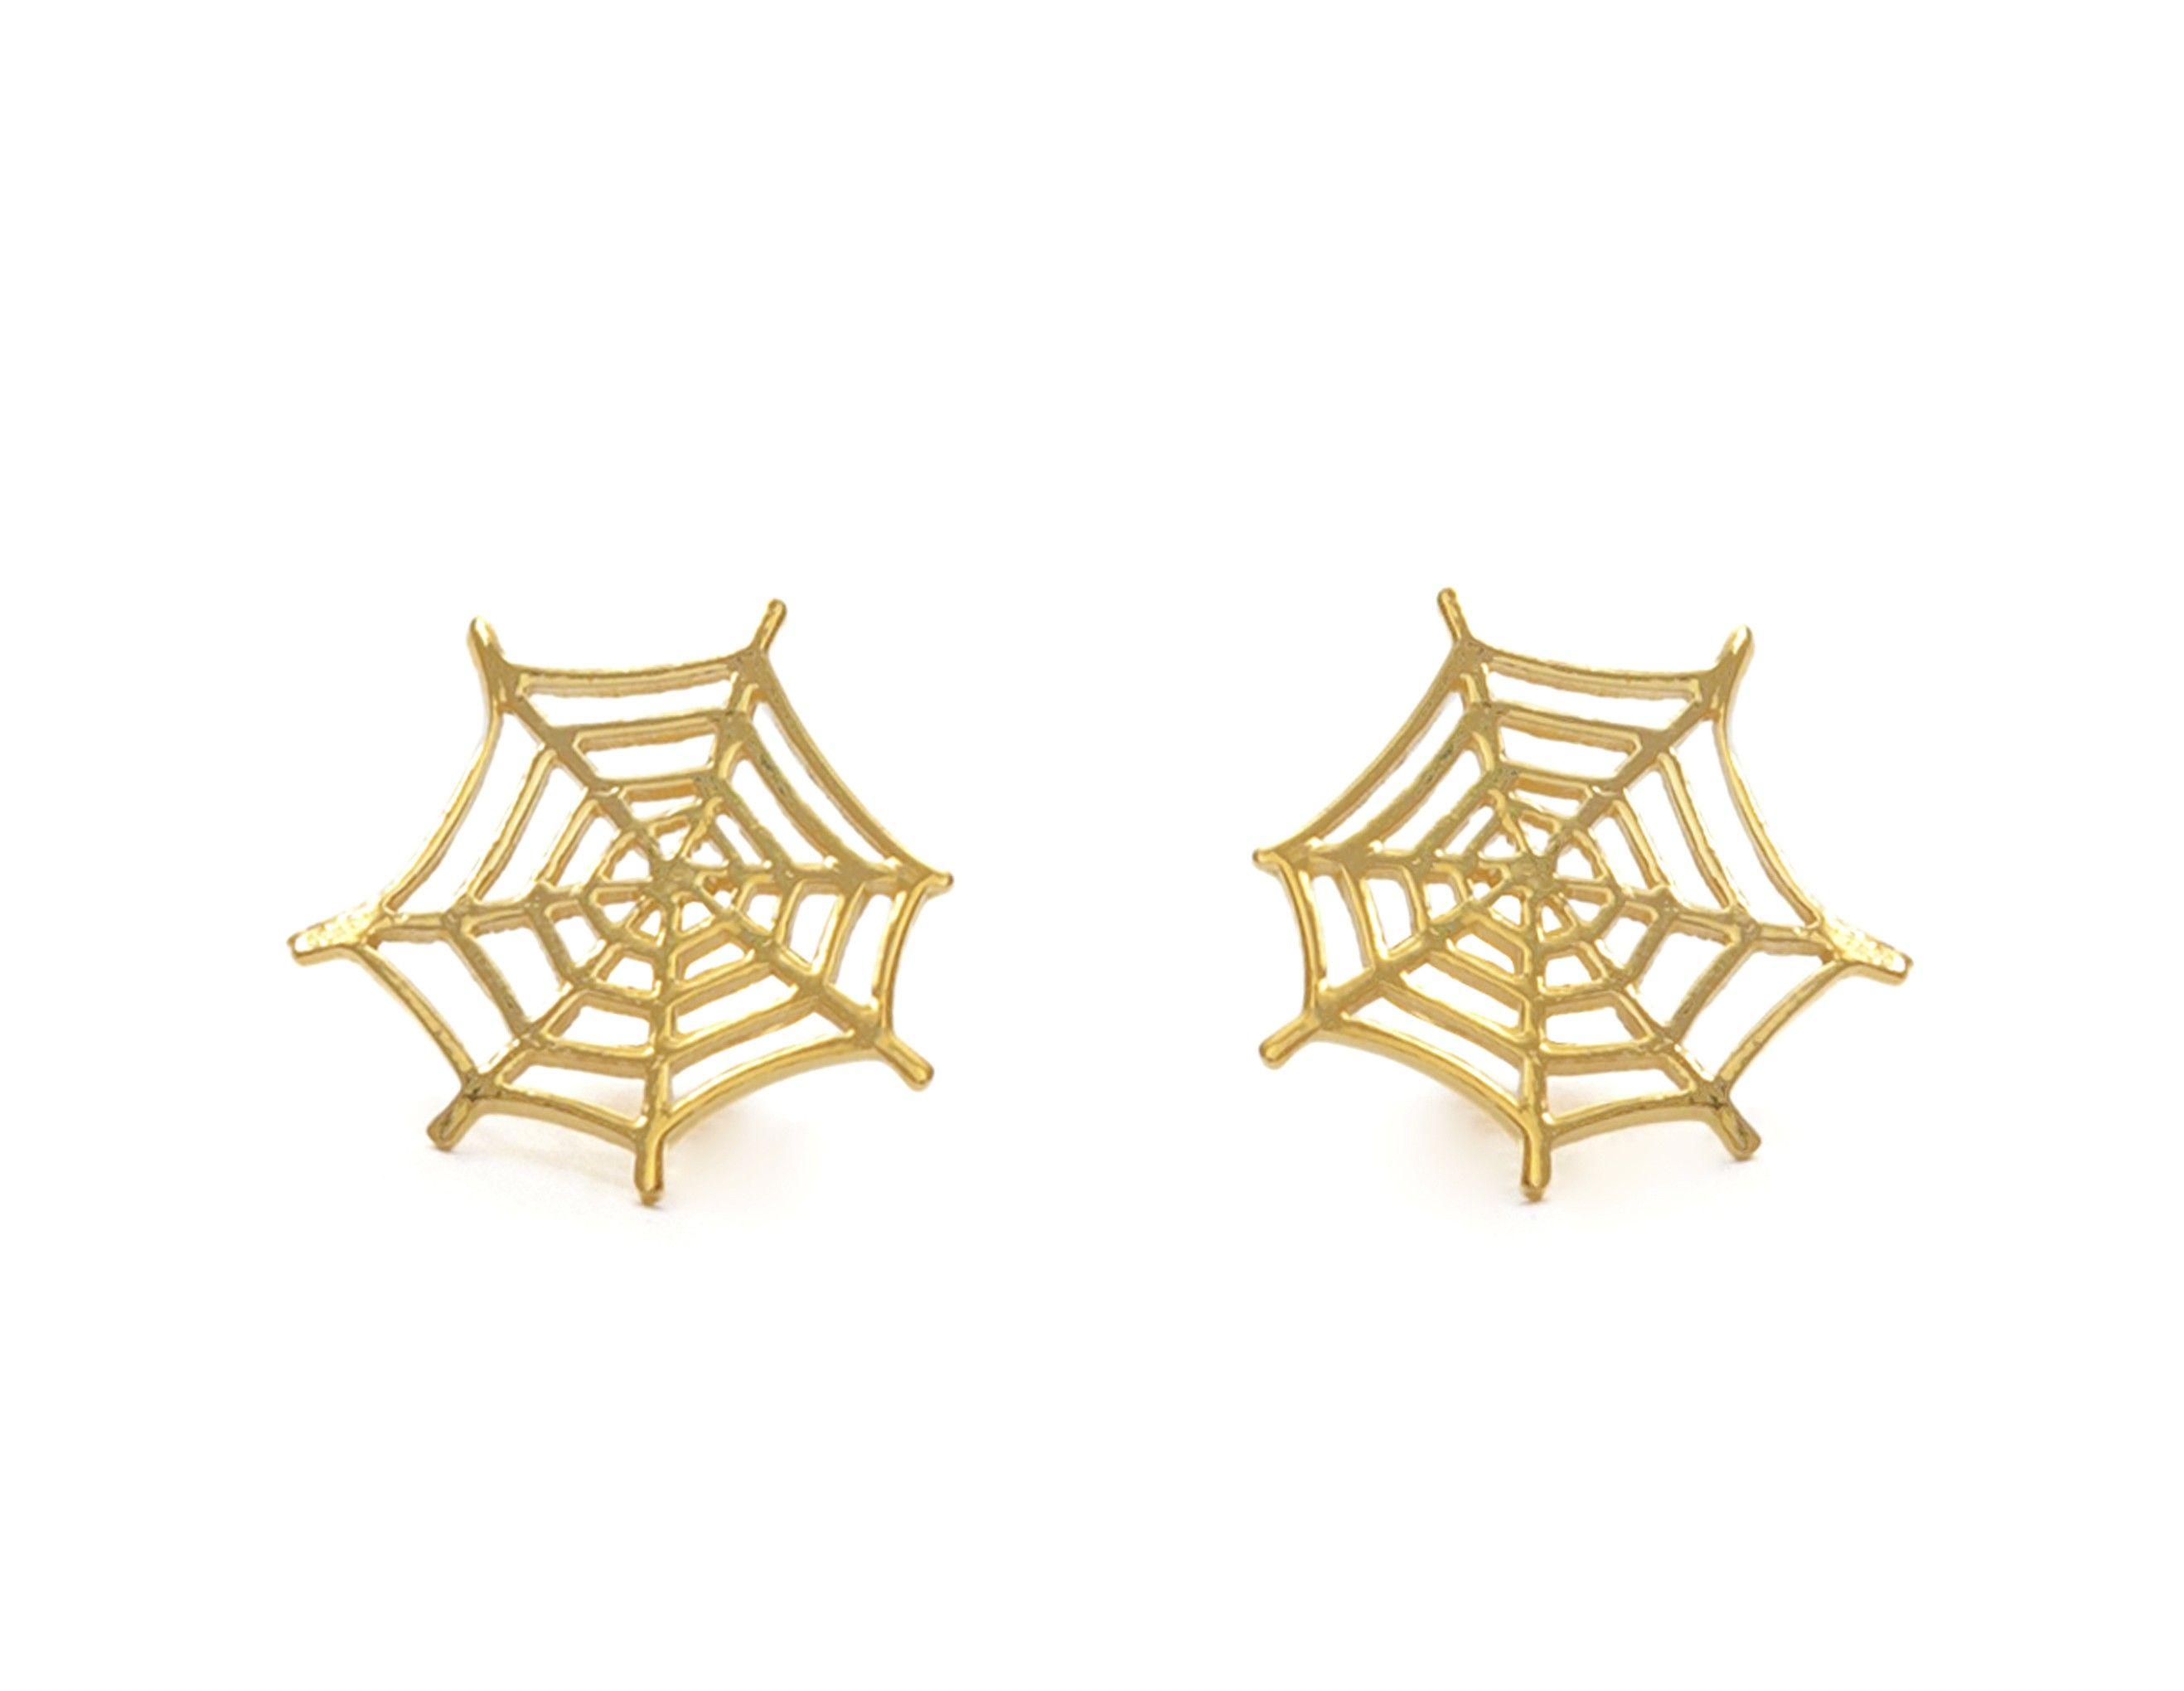 Charlotte Olympia earrings